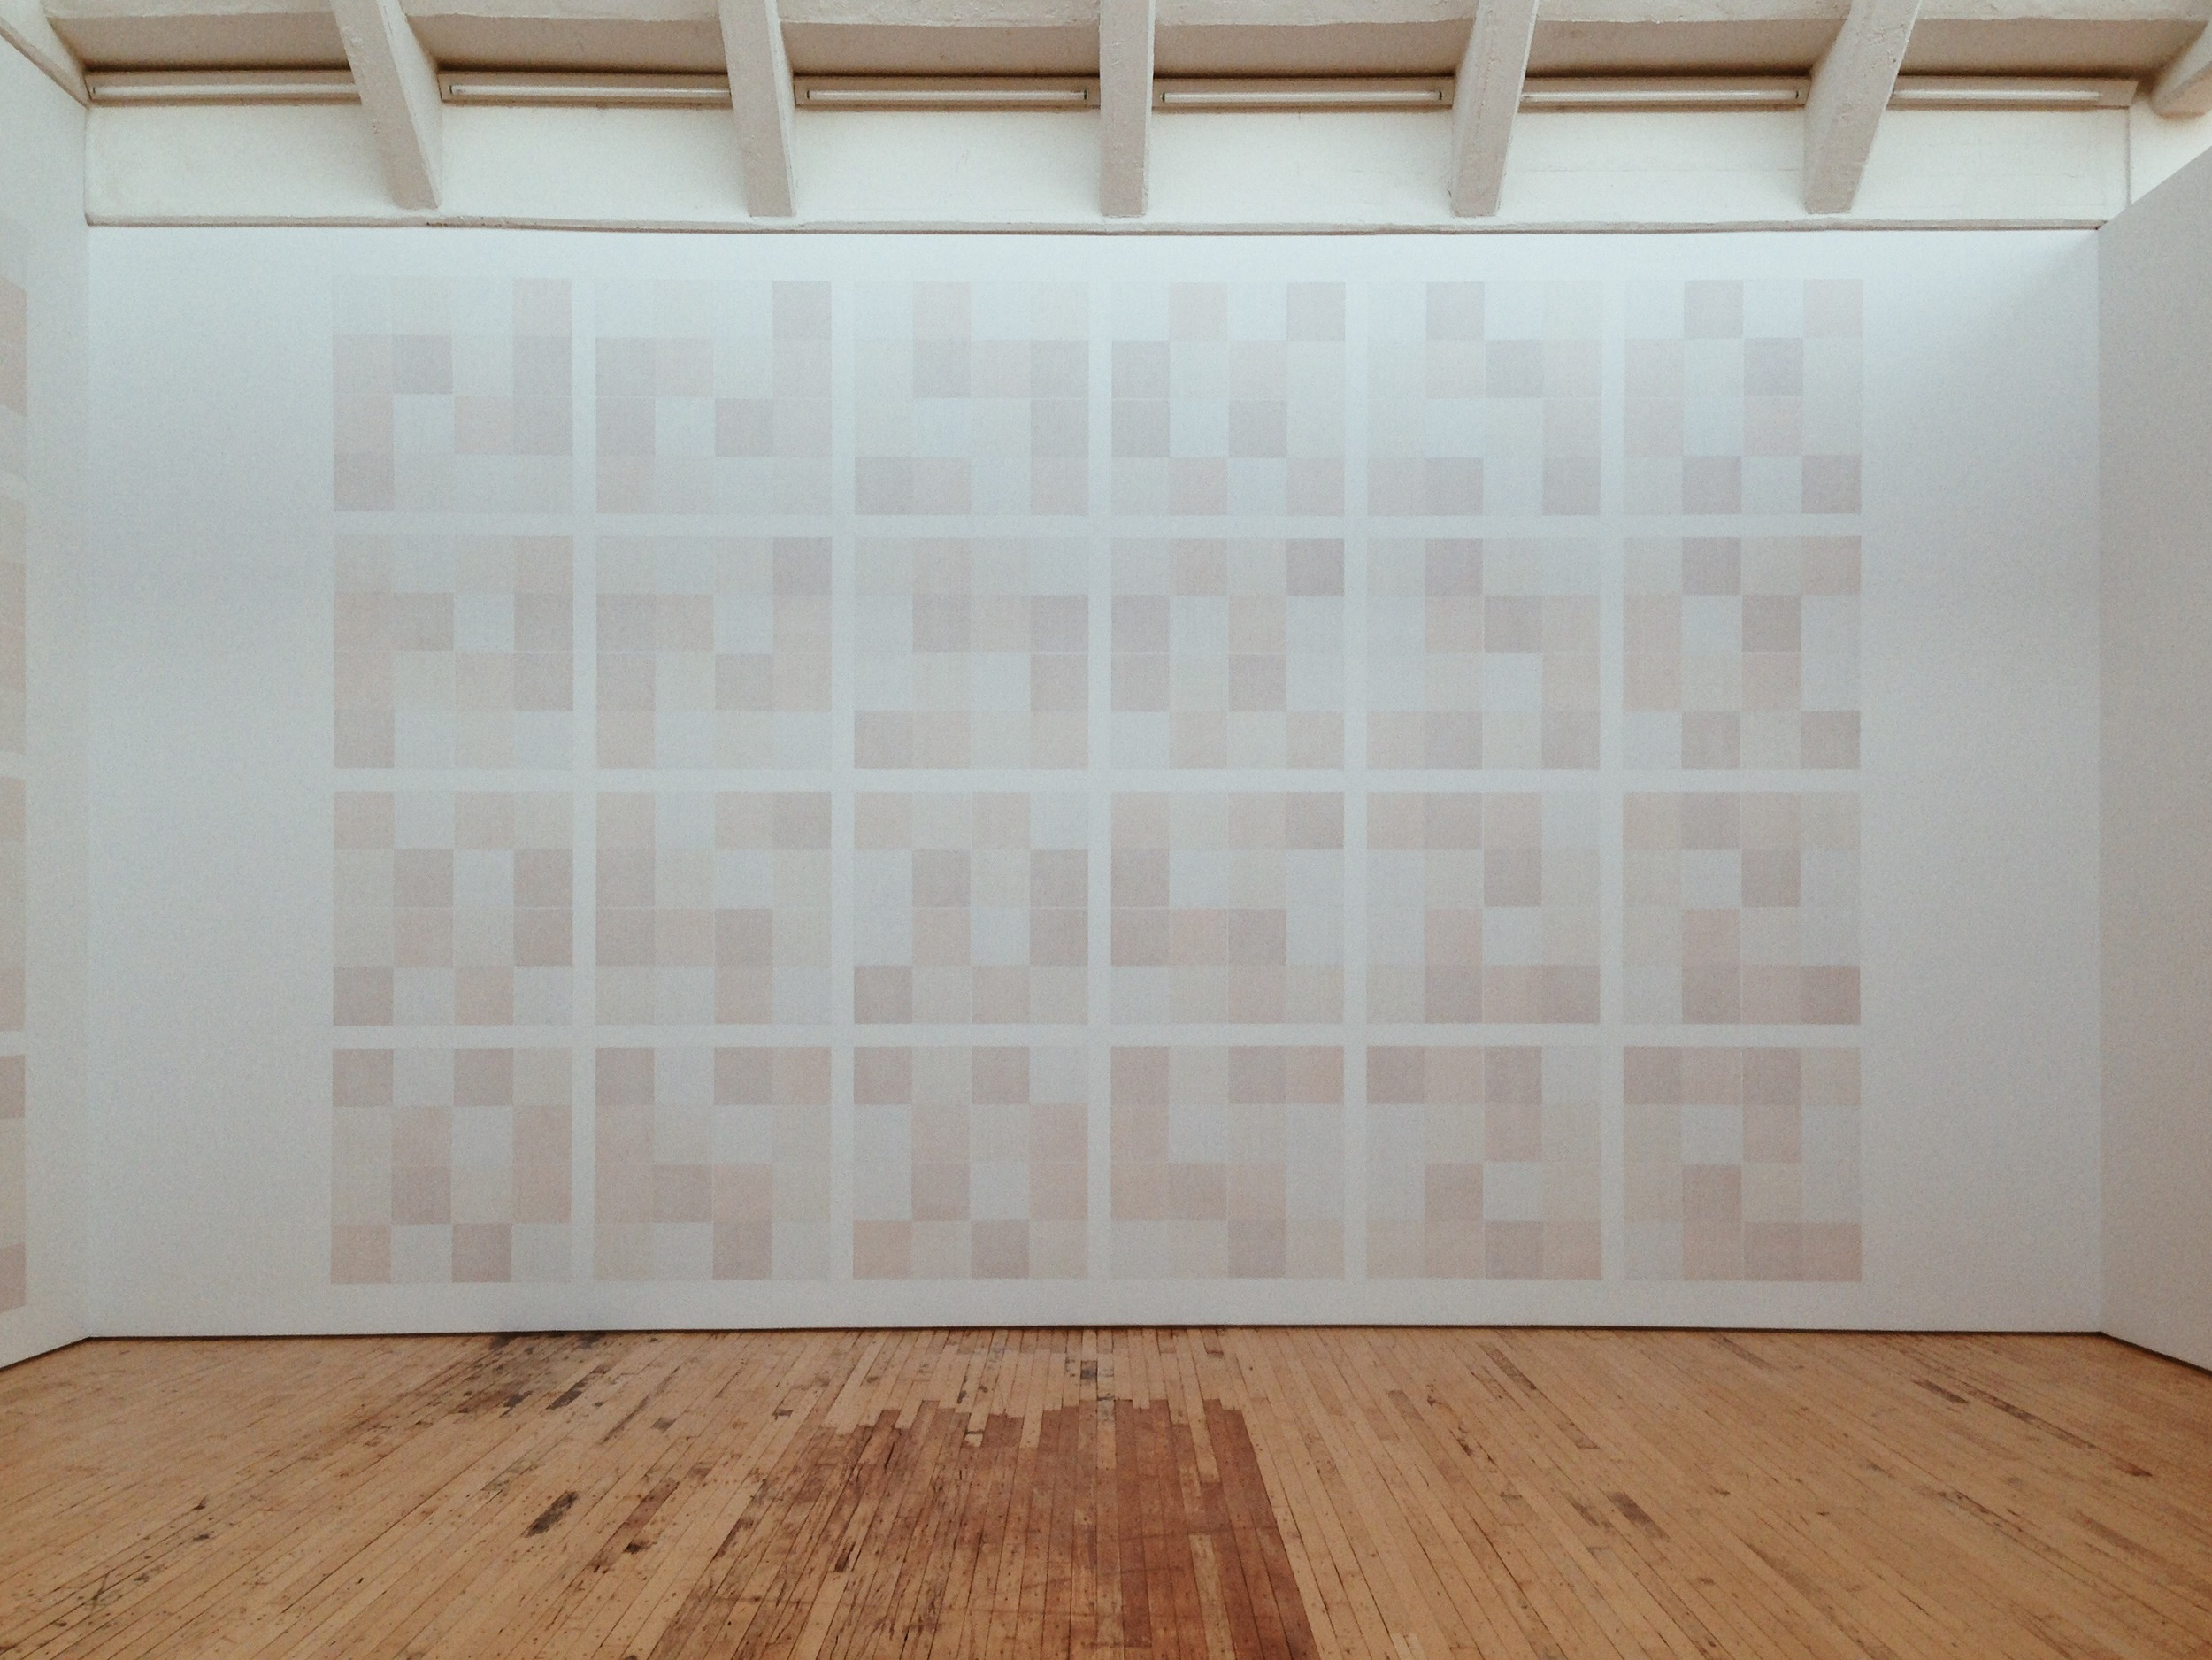 Sol LeWitt,Wall Drawing #1085: Drawing Series-Composite,Part I–IV, #1–24, A+B, (detail), 1968/2003. |Photo: Jinglu Huang